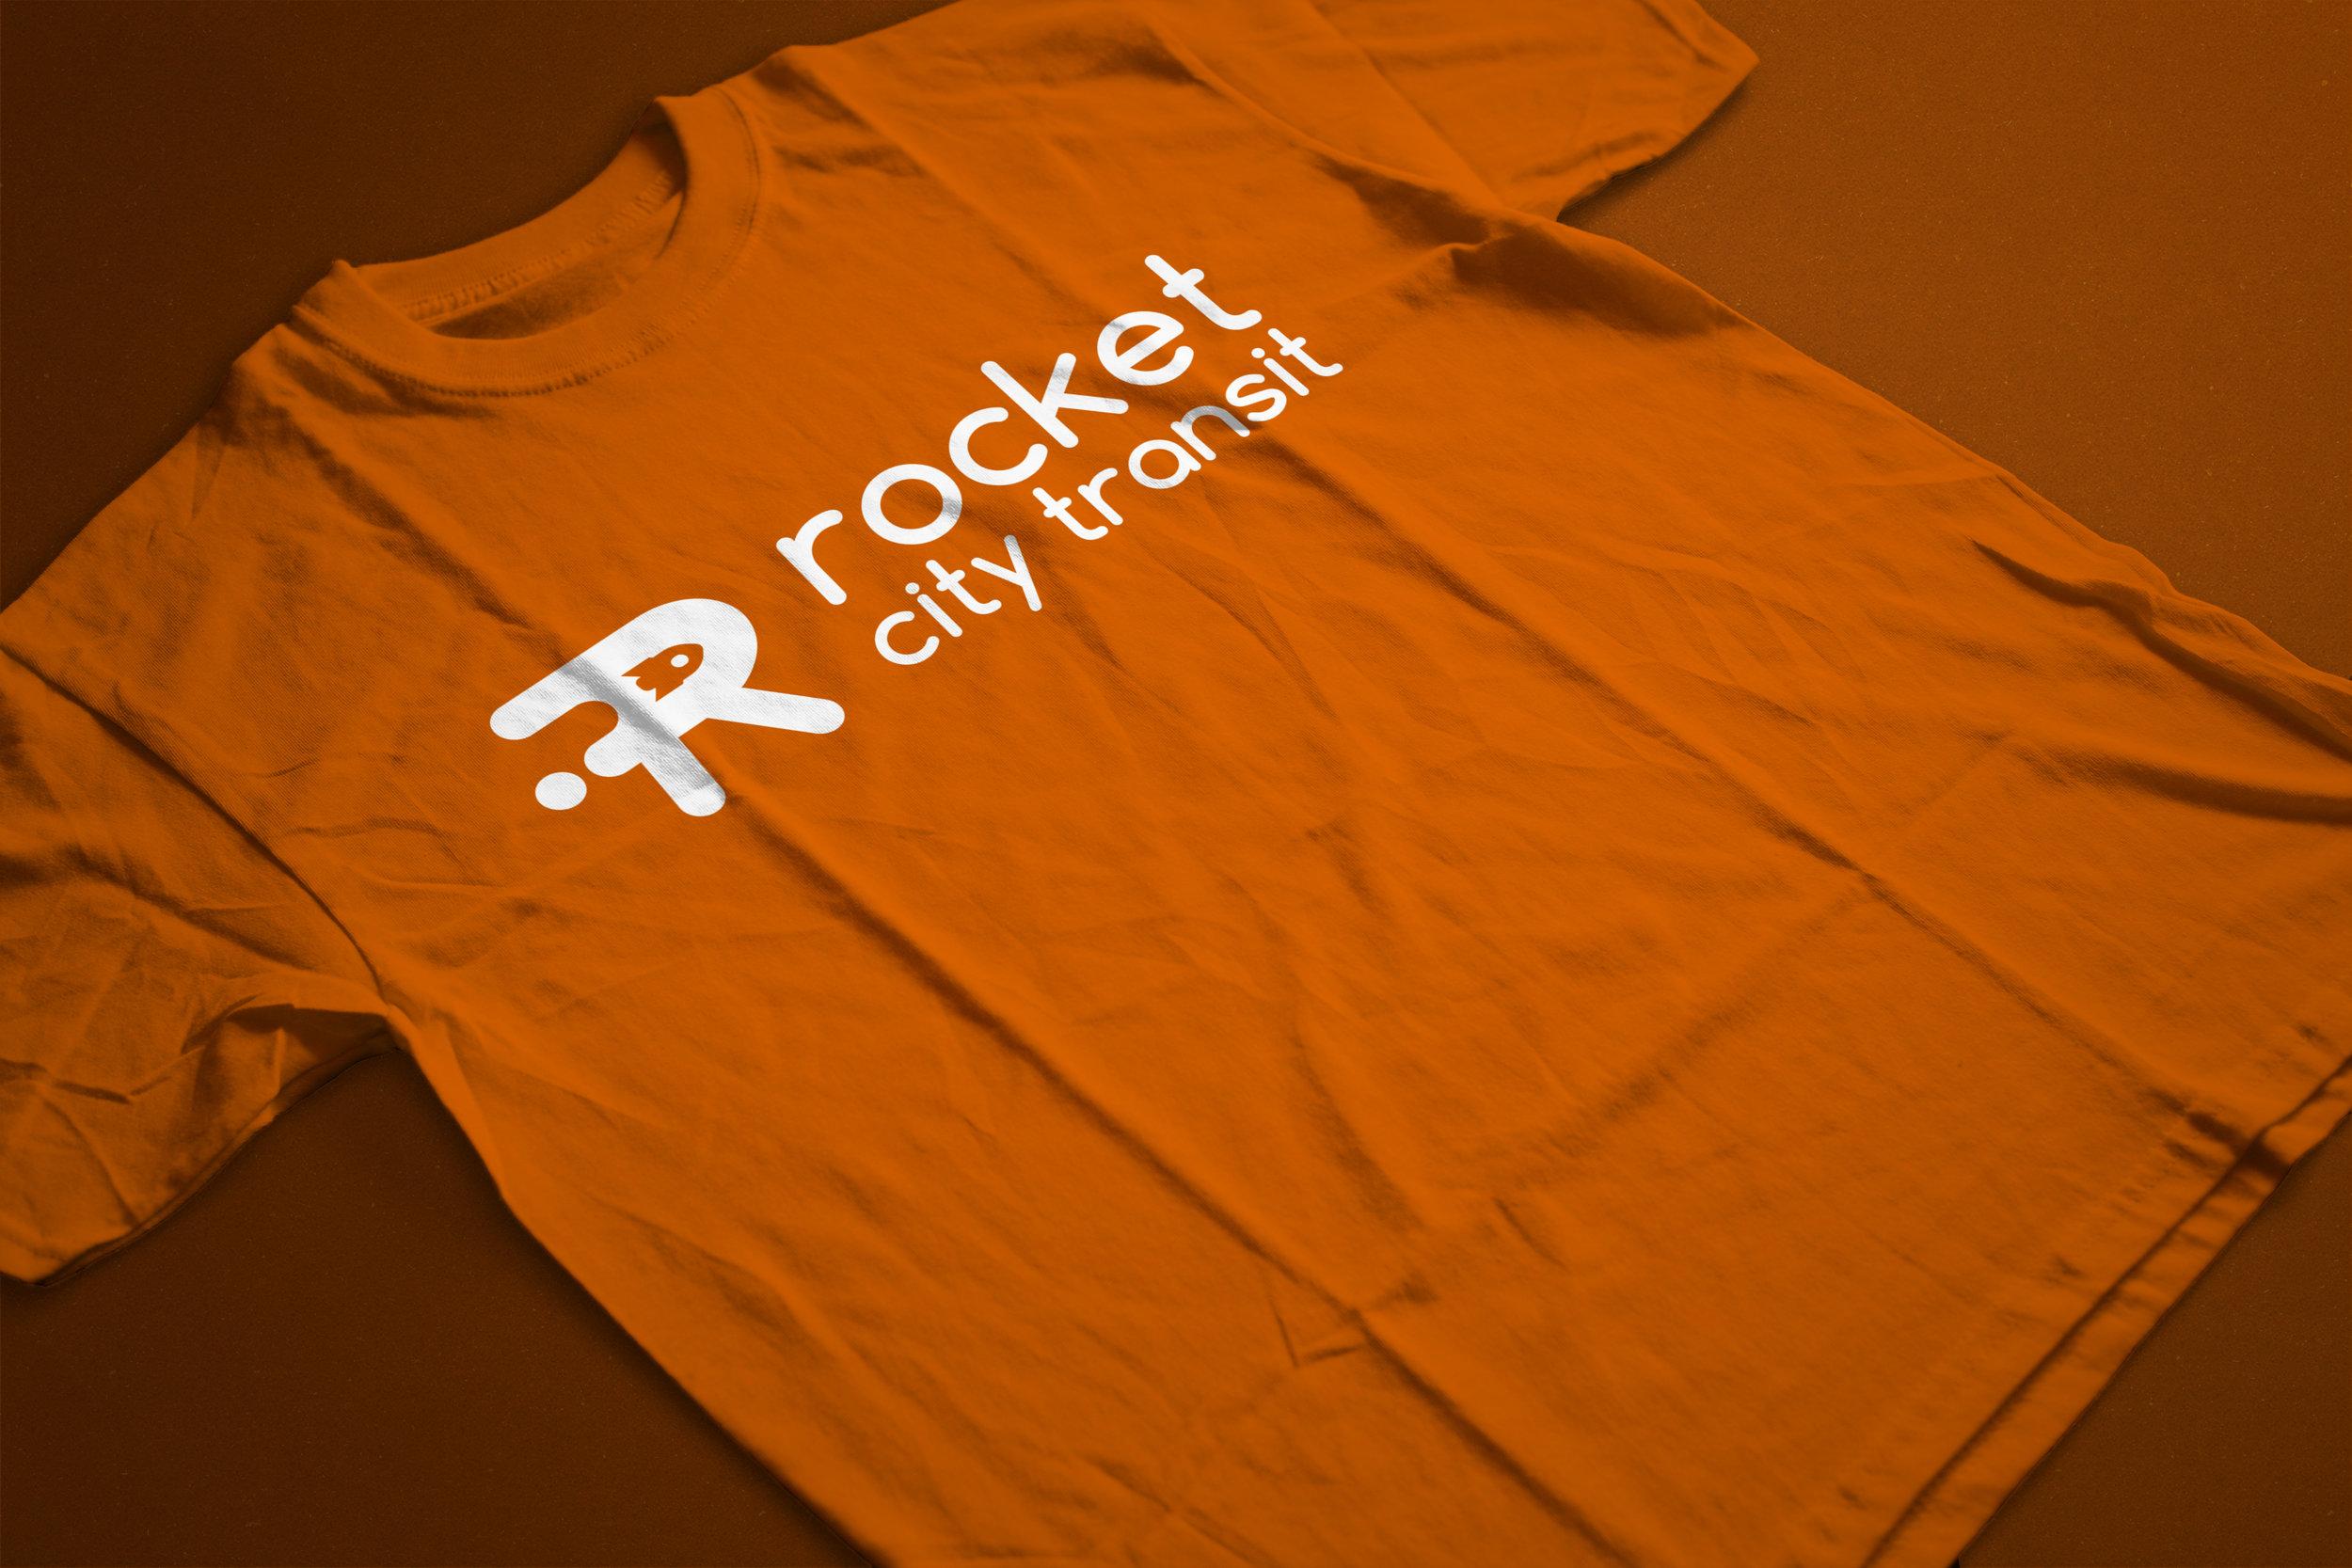 CityofHSV_PublicTransit_Rebrand_CONCEPT3_RCT_shirt_R1-v1.jpg